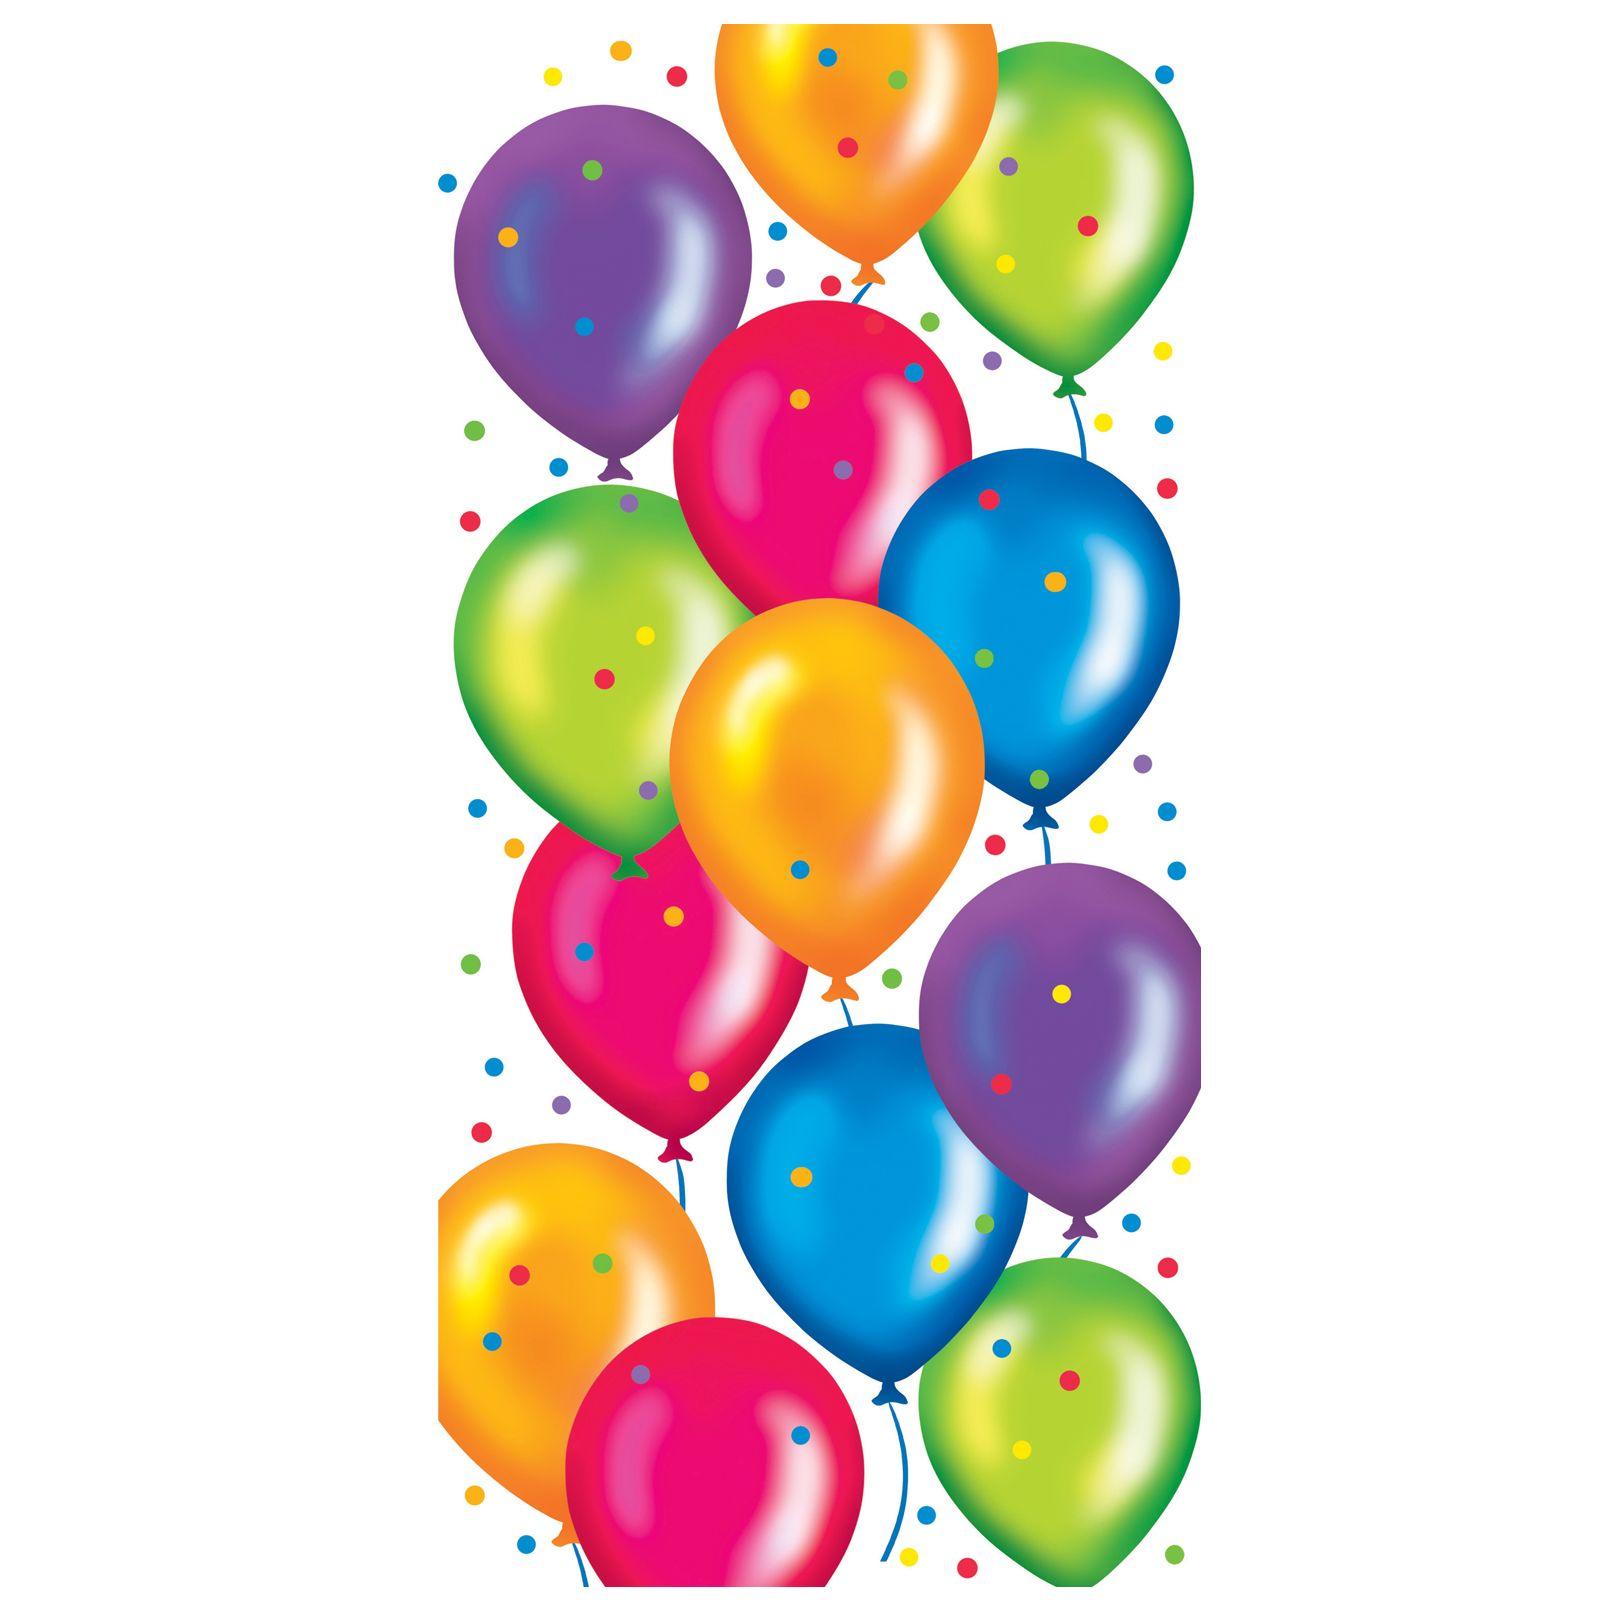 Birthday Balloons Images Part - 20: Birthday Balloons | Birthday Balloons Cello Bags | ThePartyWorks